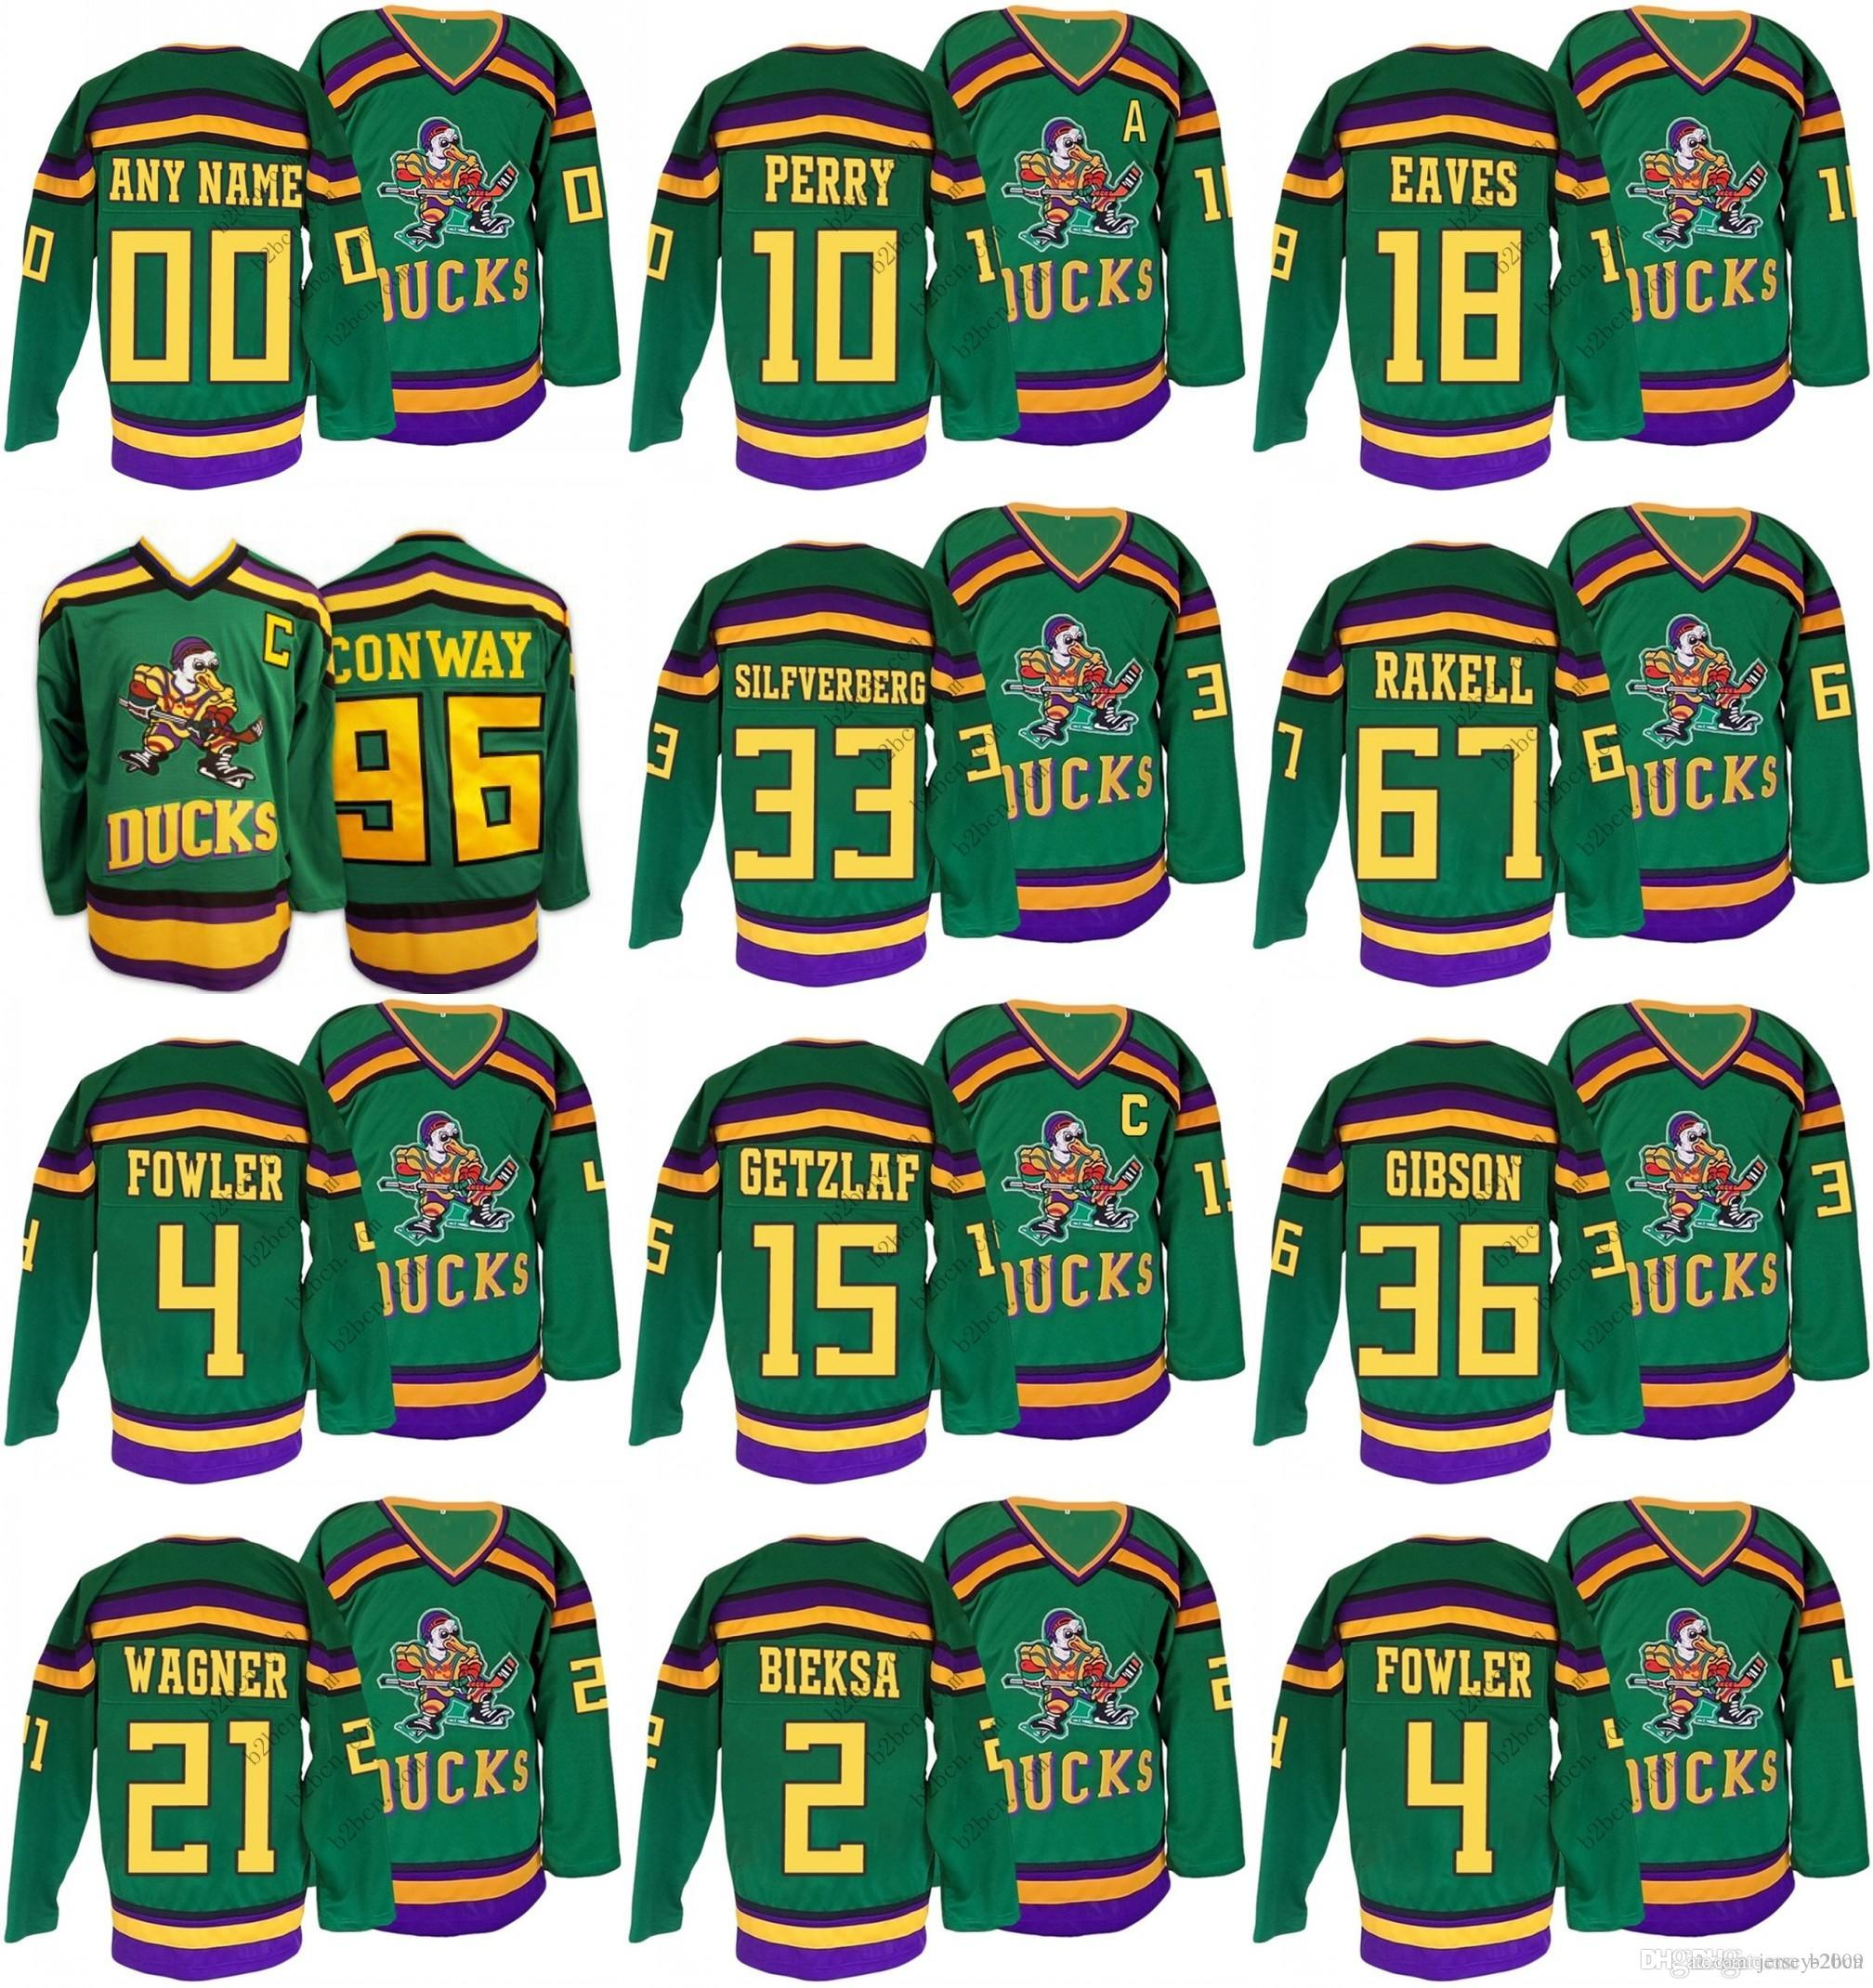 29d397f4b 2019 Customized Men 17 Ryan Kesler 45 Sami Vatanen 36 John Gibson 2 Kevin  Bieksa 15 Ryan Getzlaf Anaheim Ducks Premier Jersey Green From Jersey 2009,  ...